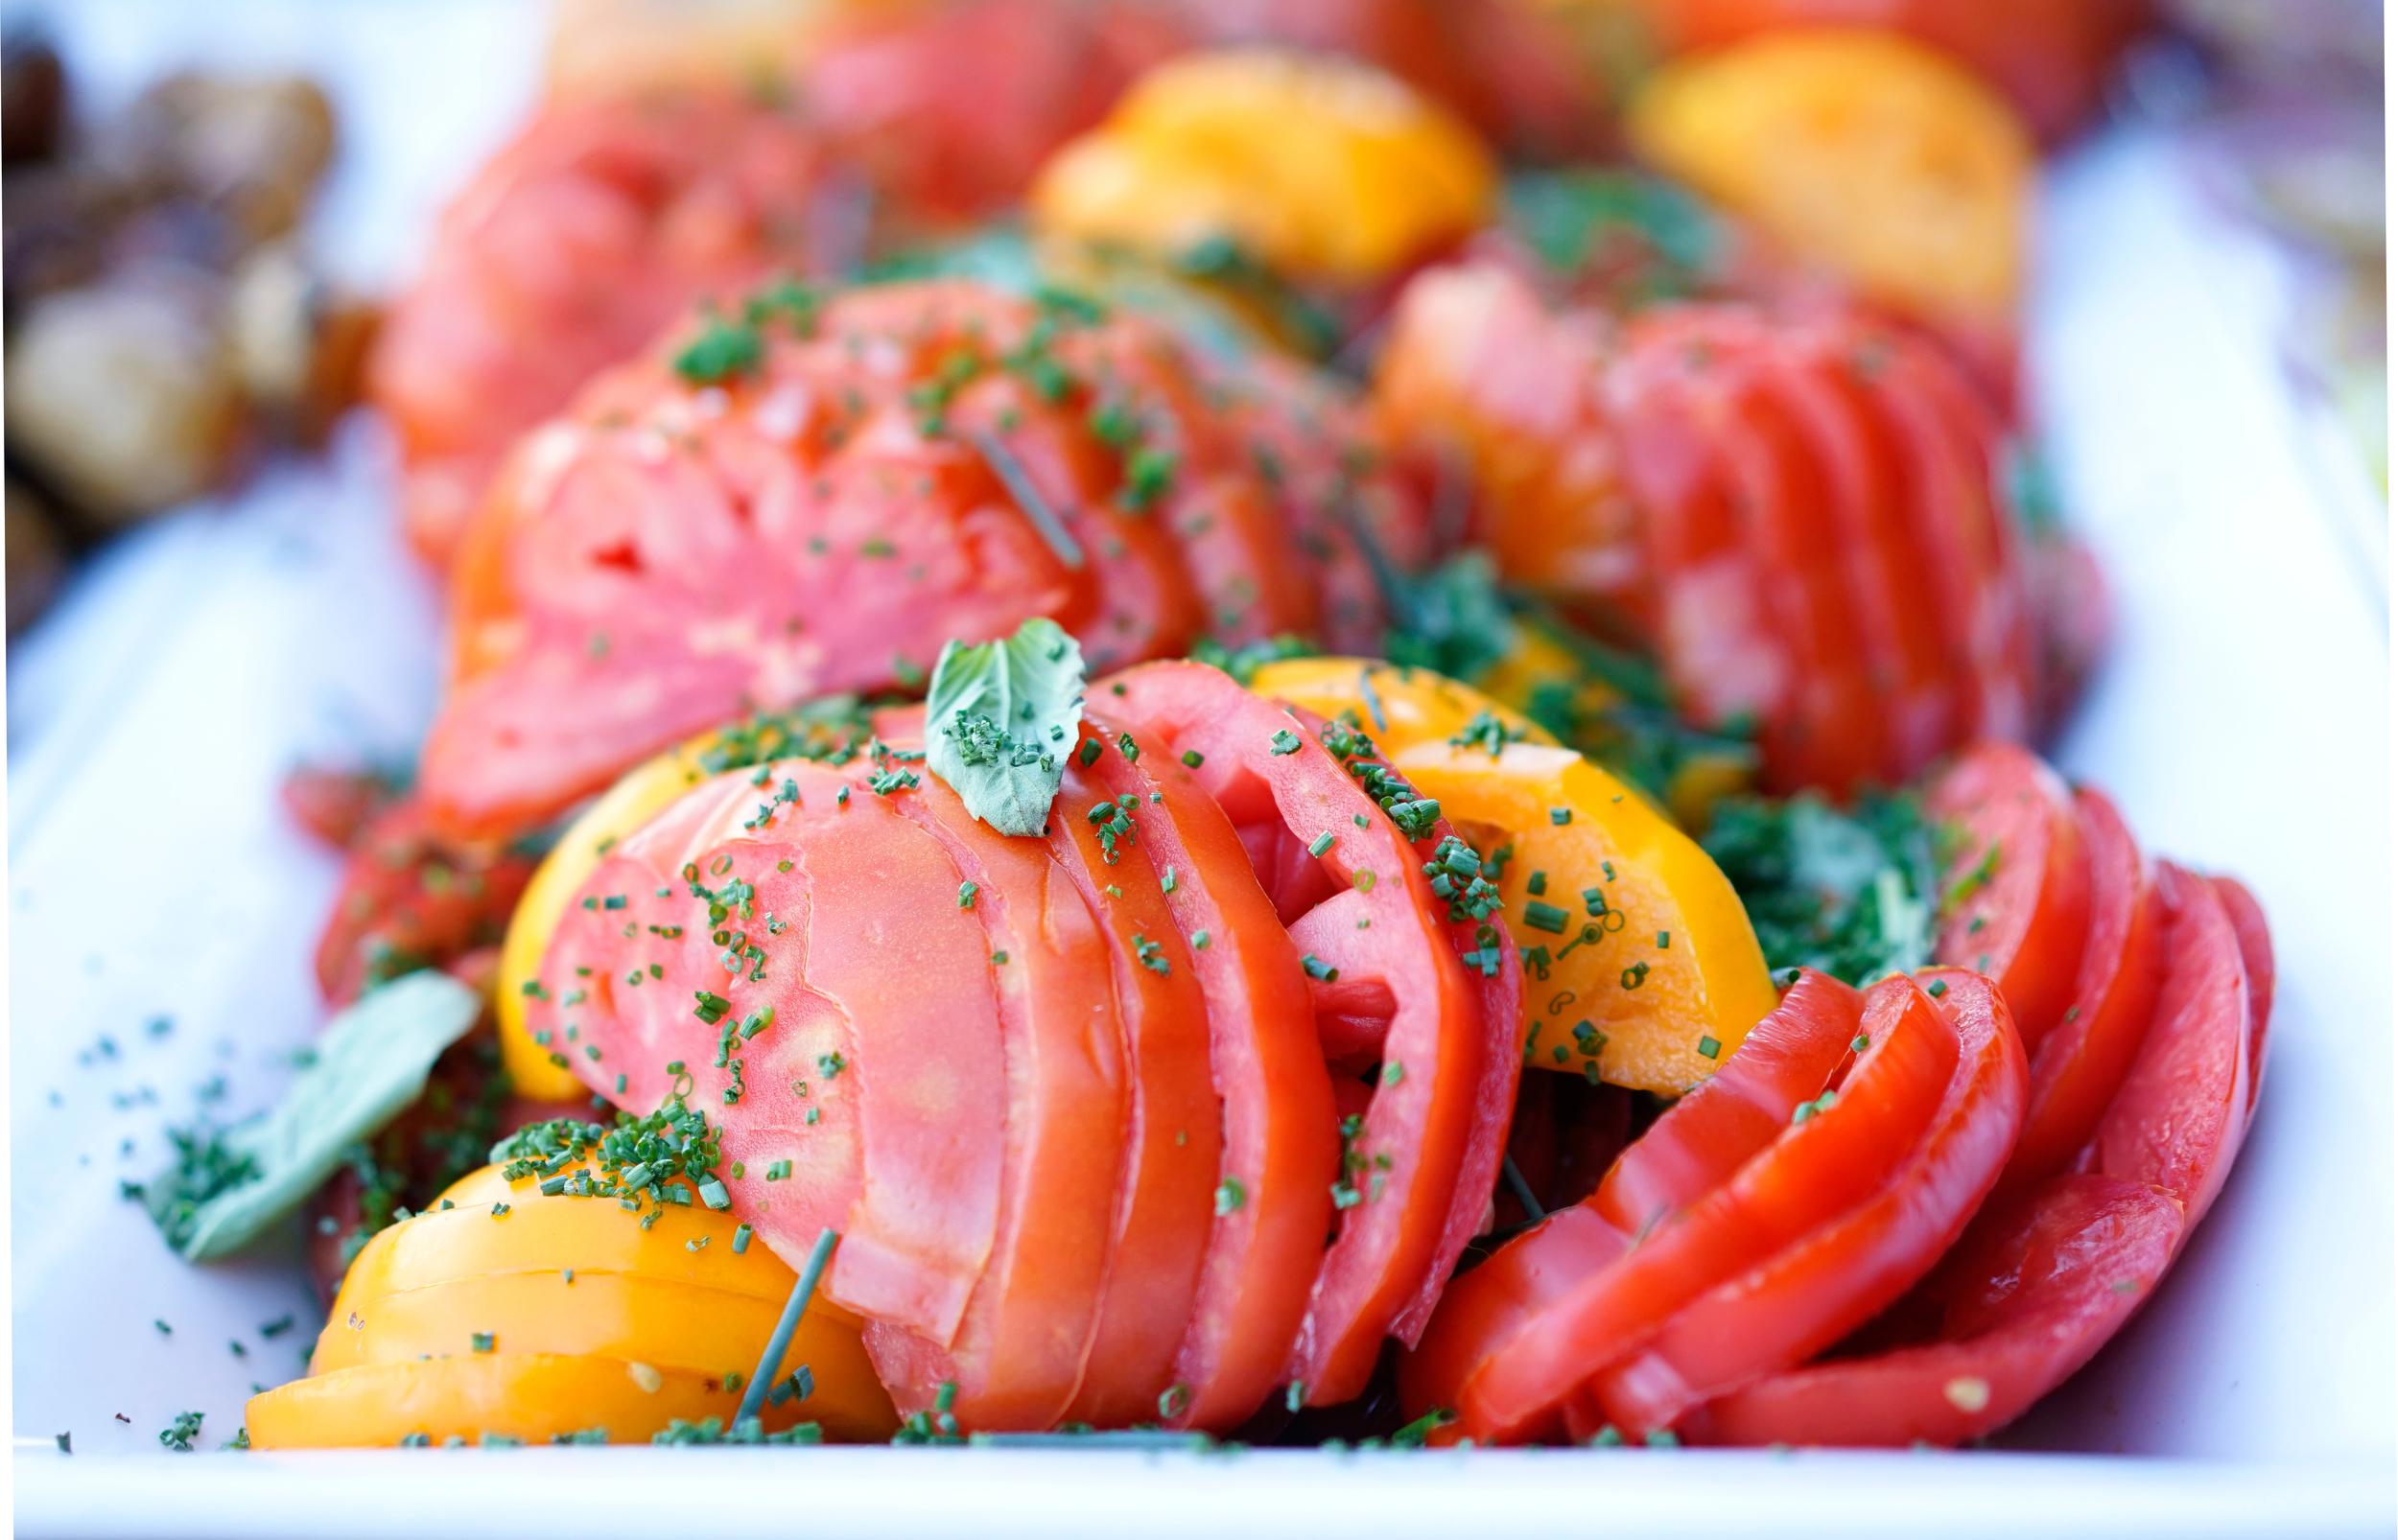 BBQ-tomatoes.jpg